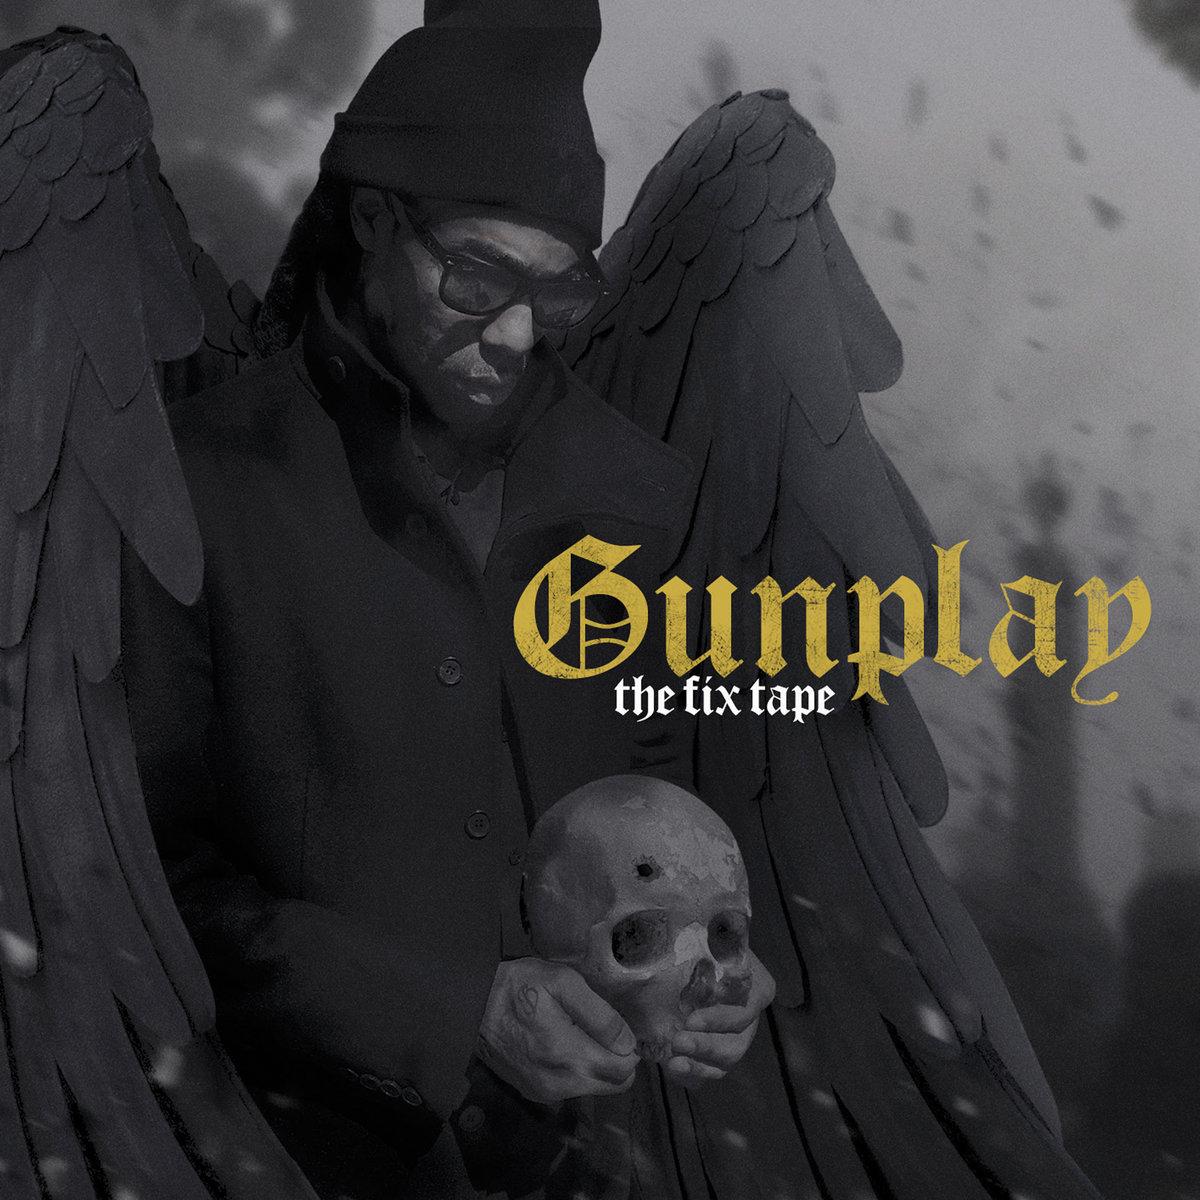 gunplay album free download